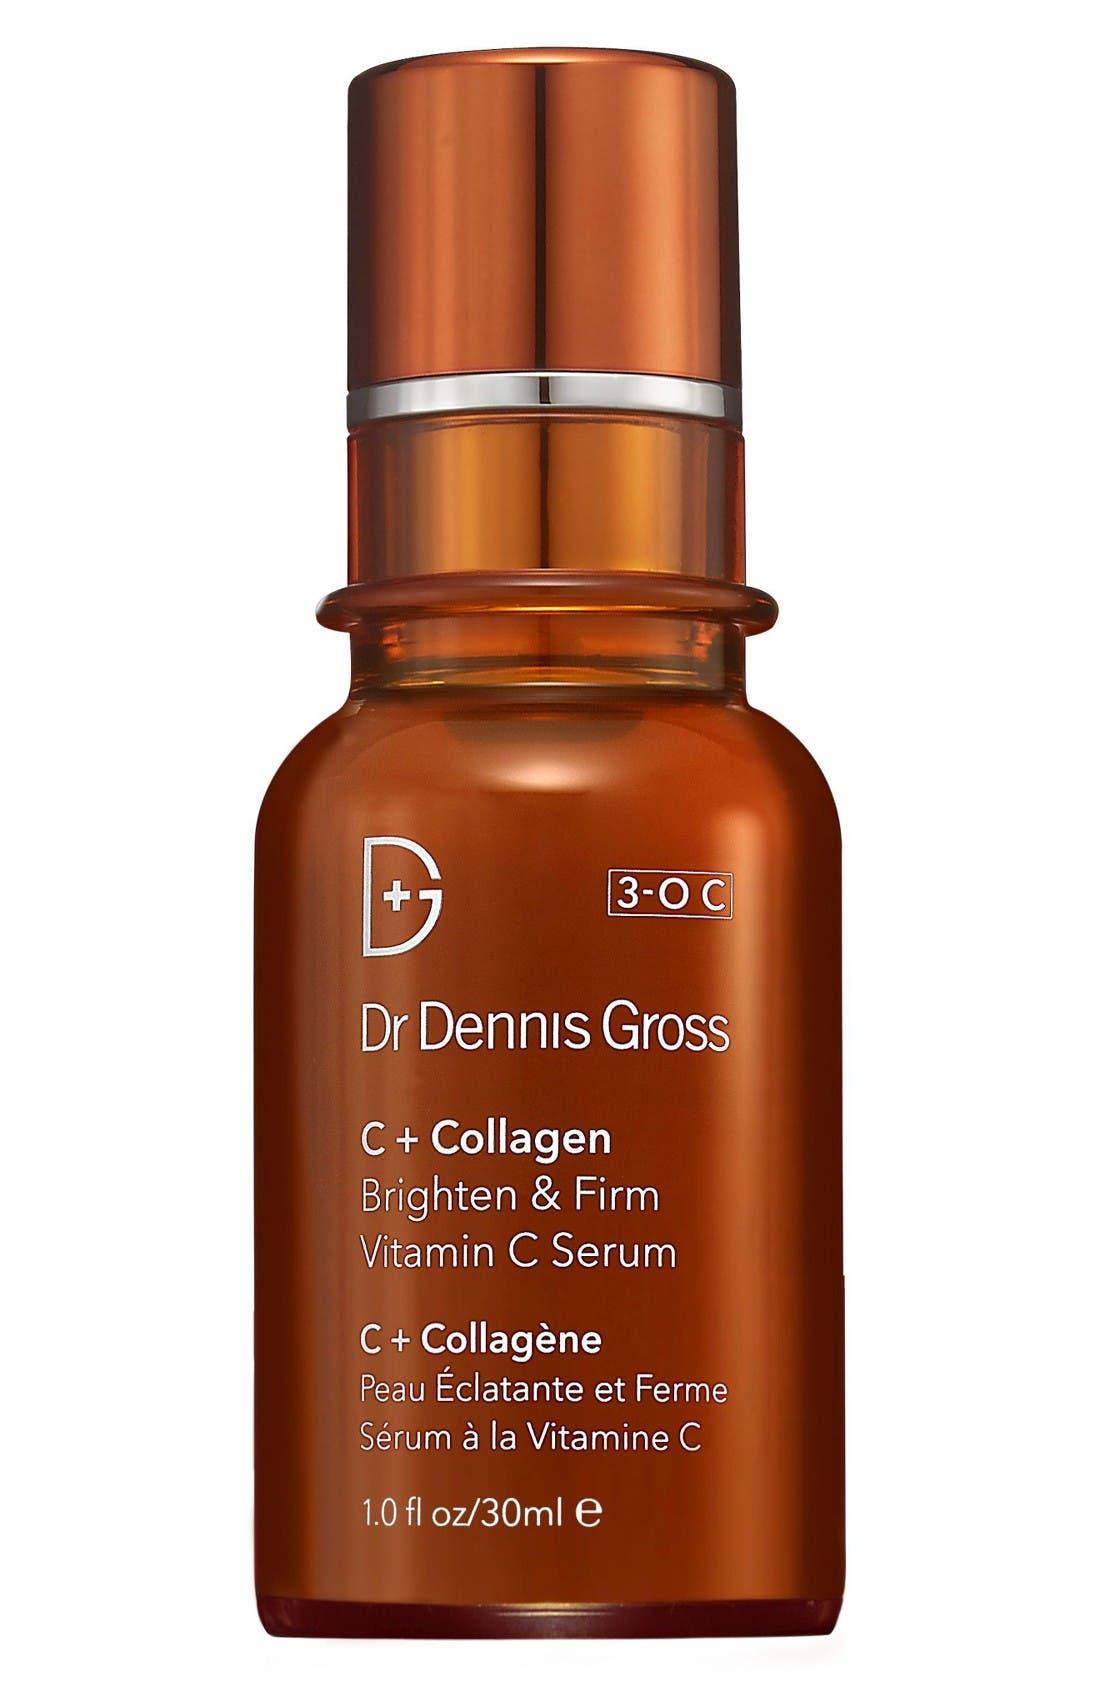 DR. DENNIS GROSS SKINCARE C+ Collagen Brighten &